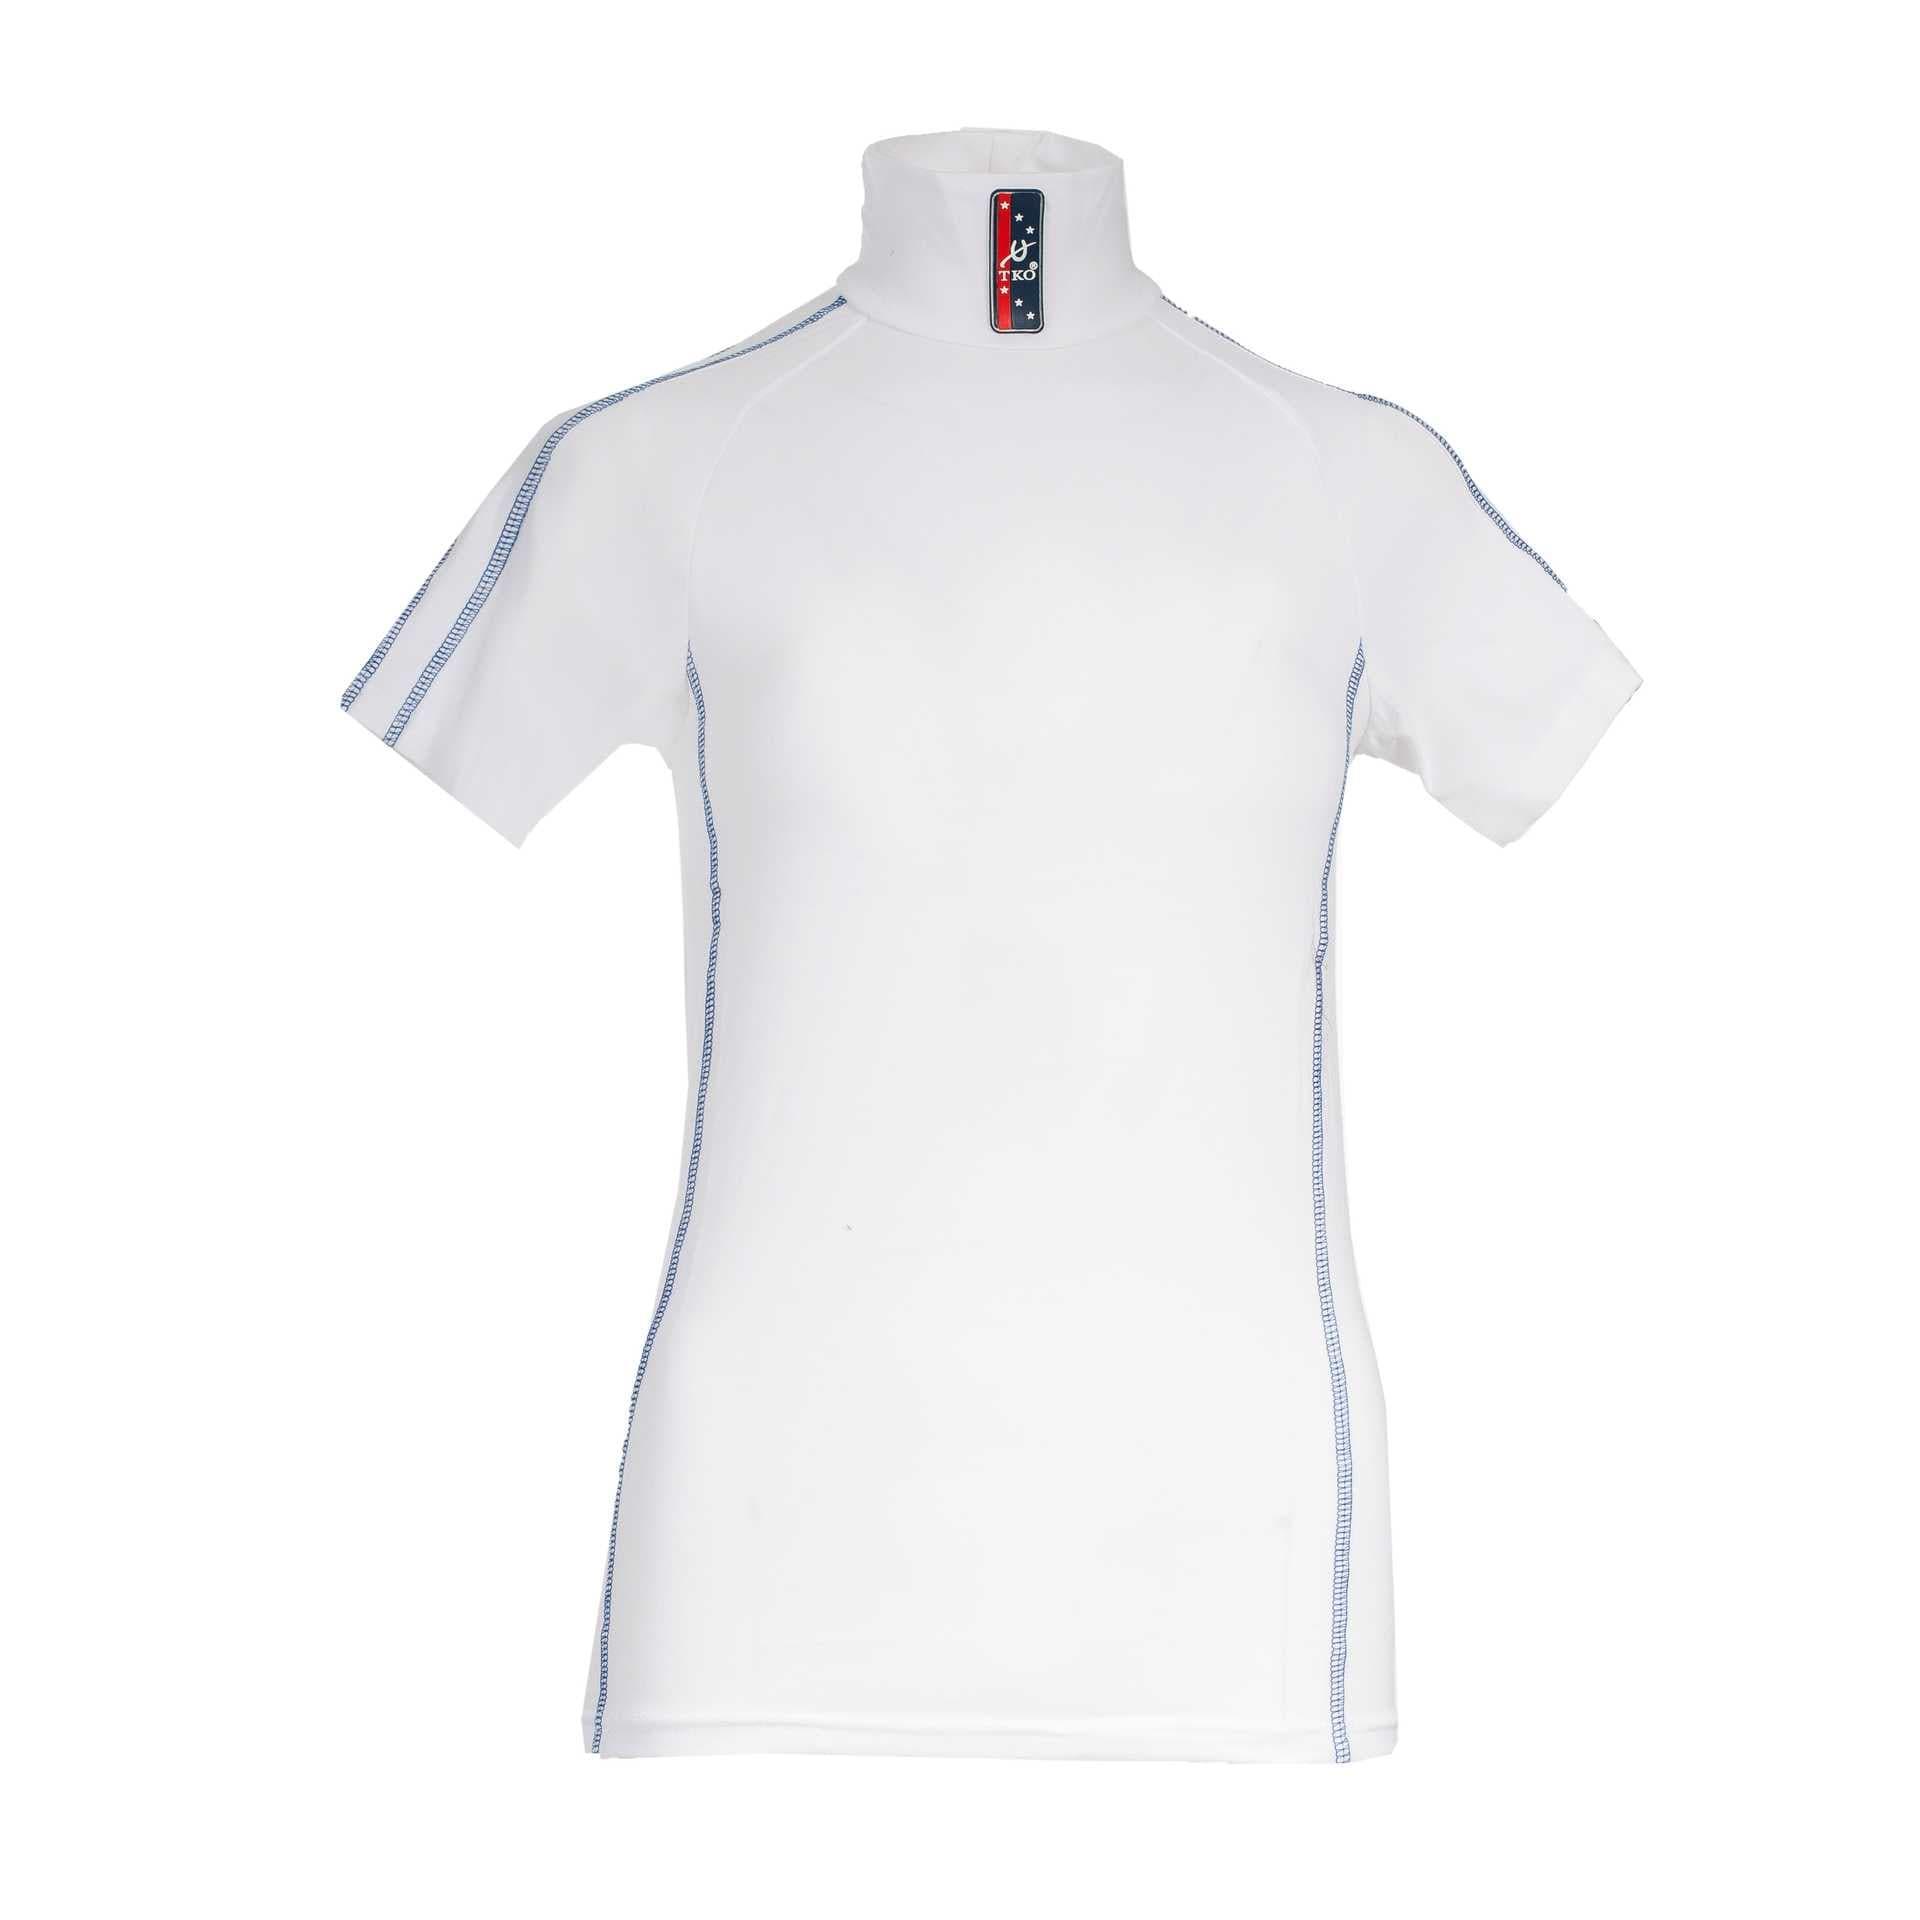 TKO Løpsskjorte i lycra med korte ermer